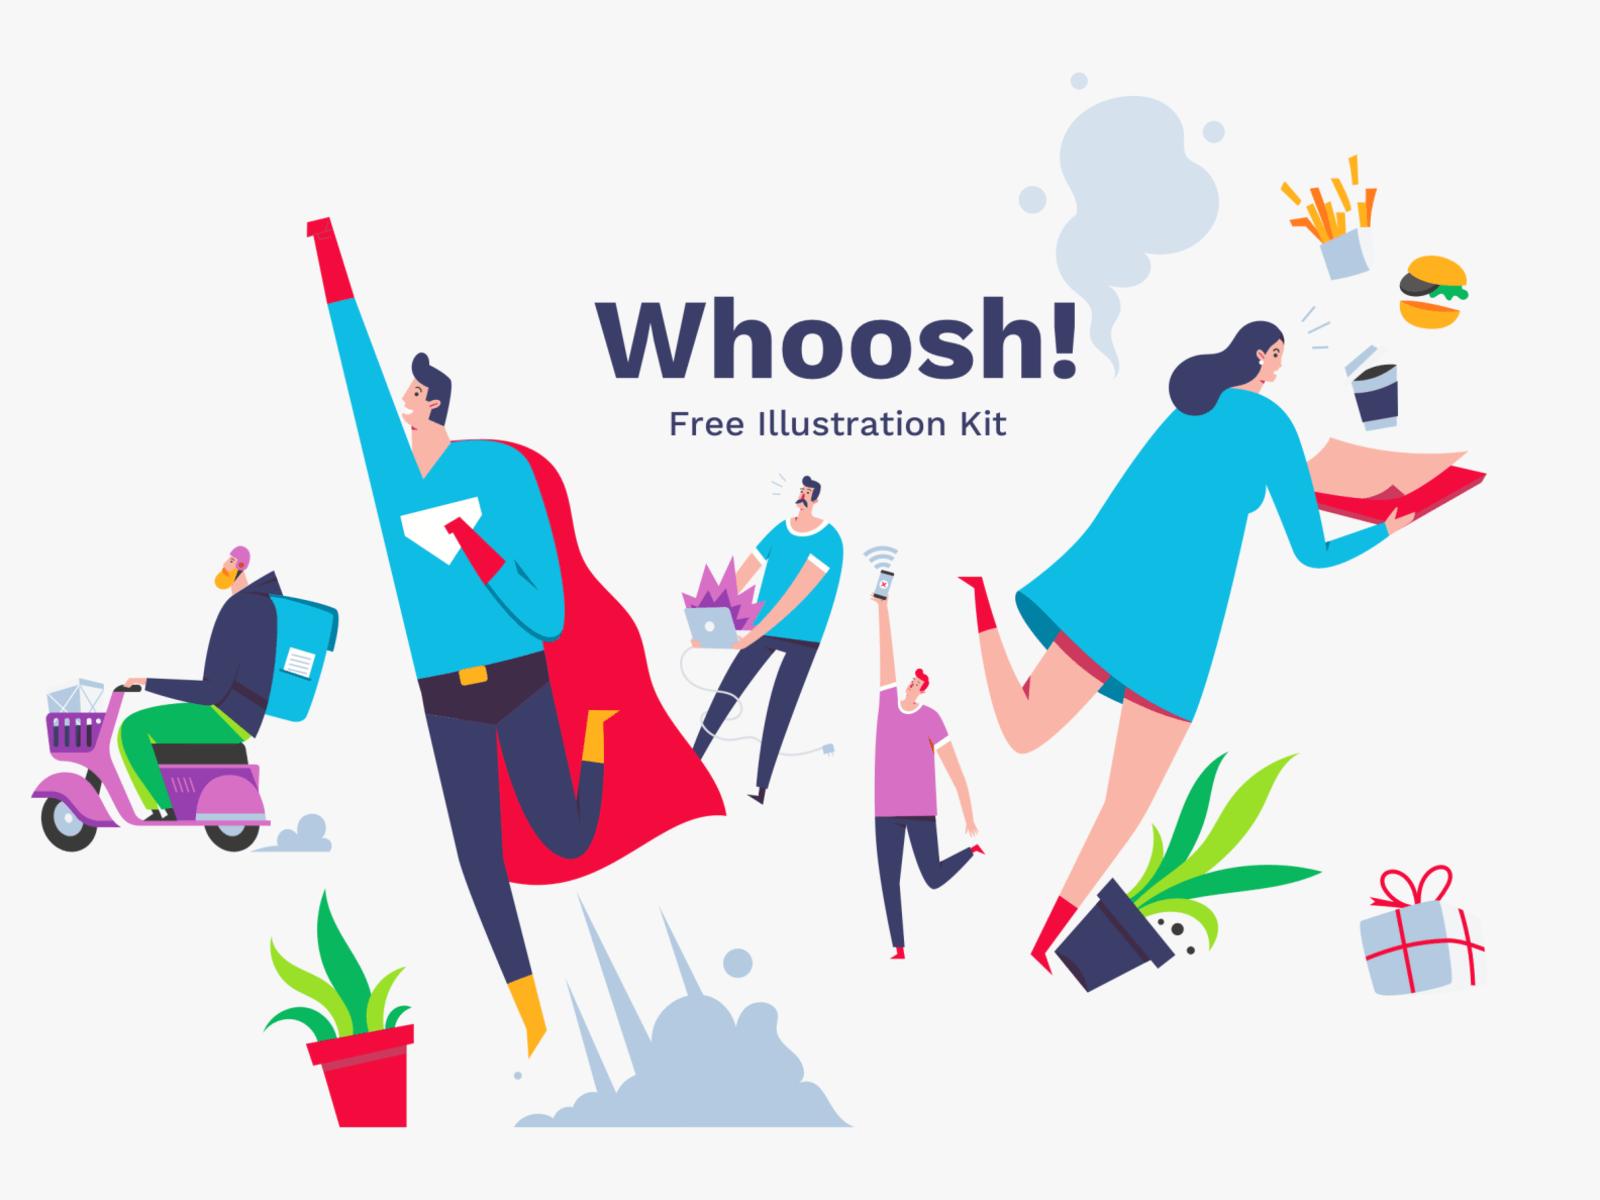 Whoosh! Illustration Kit